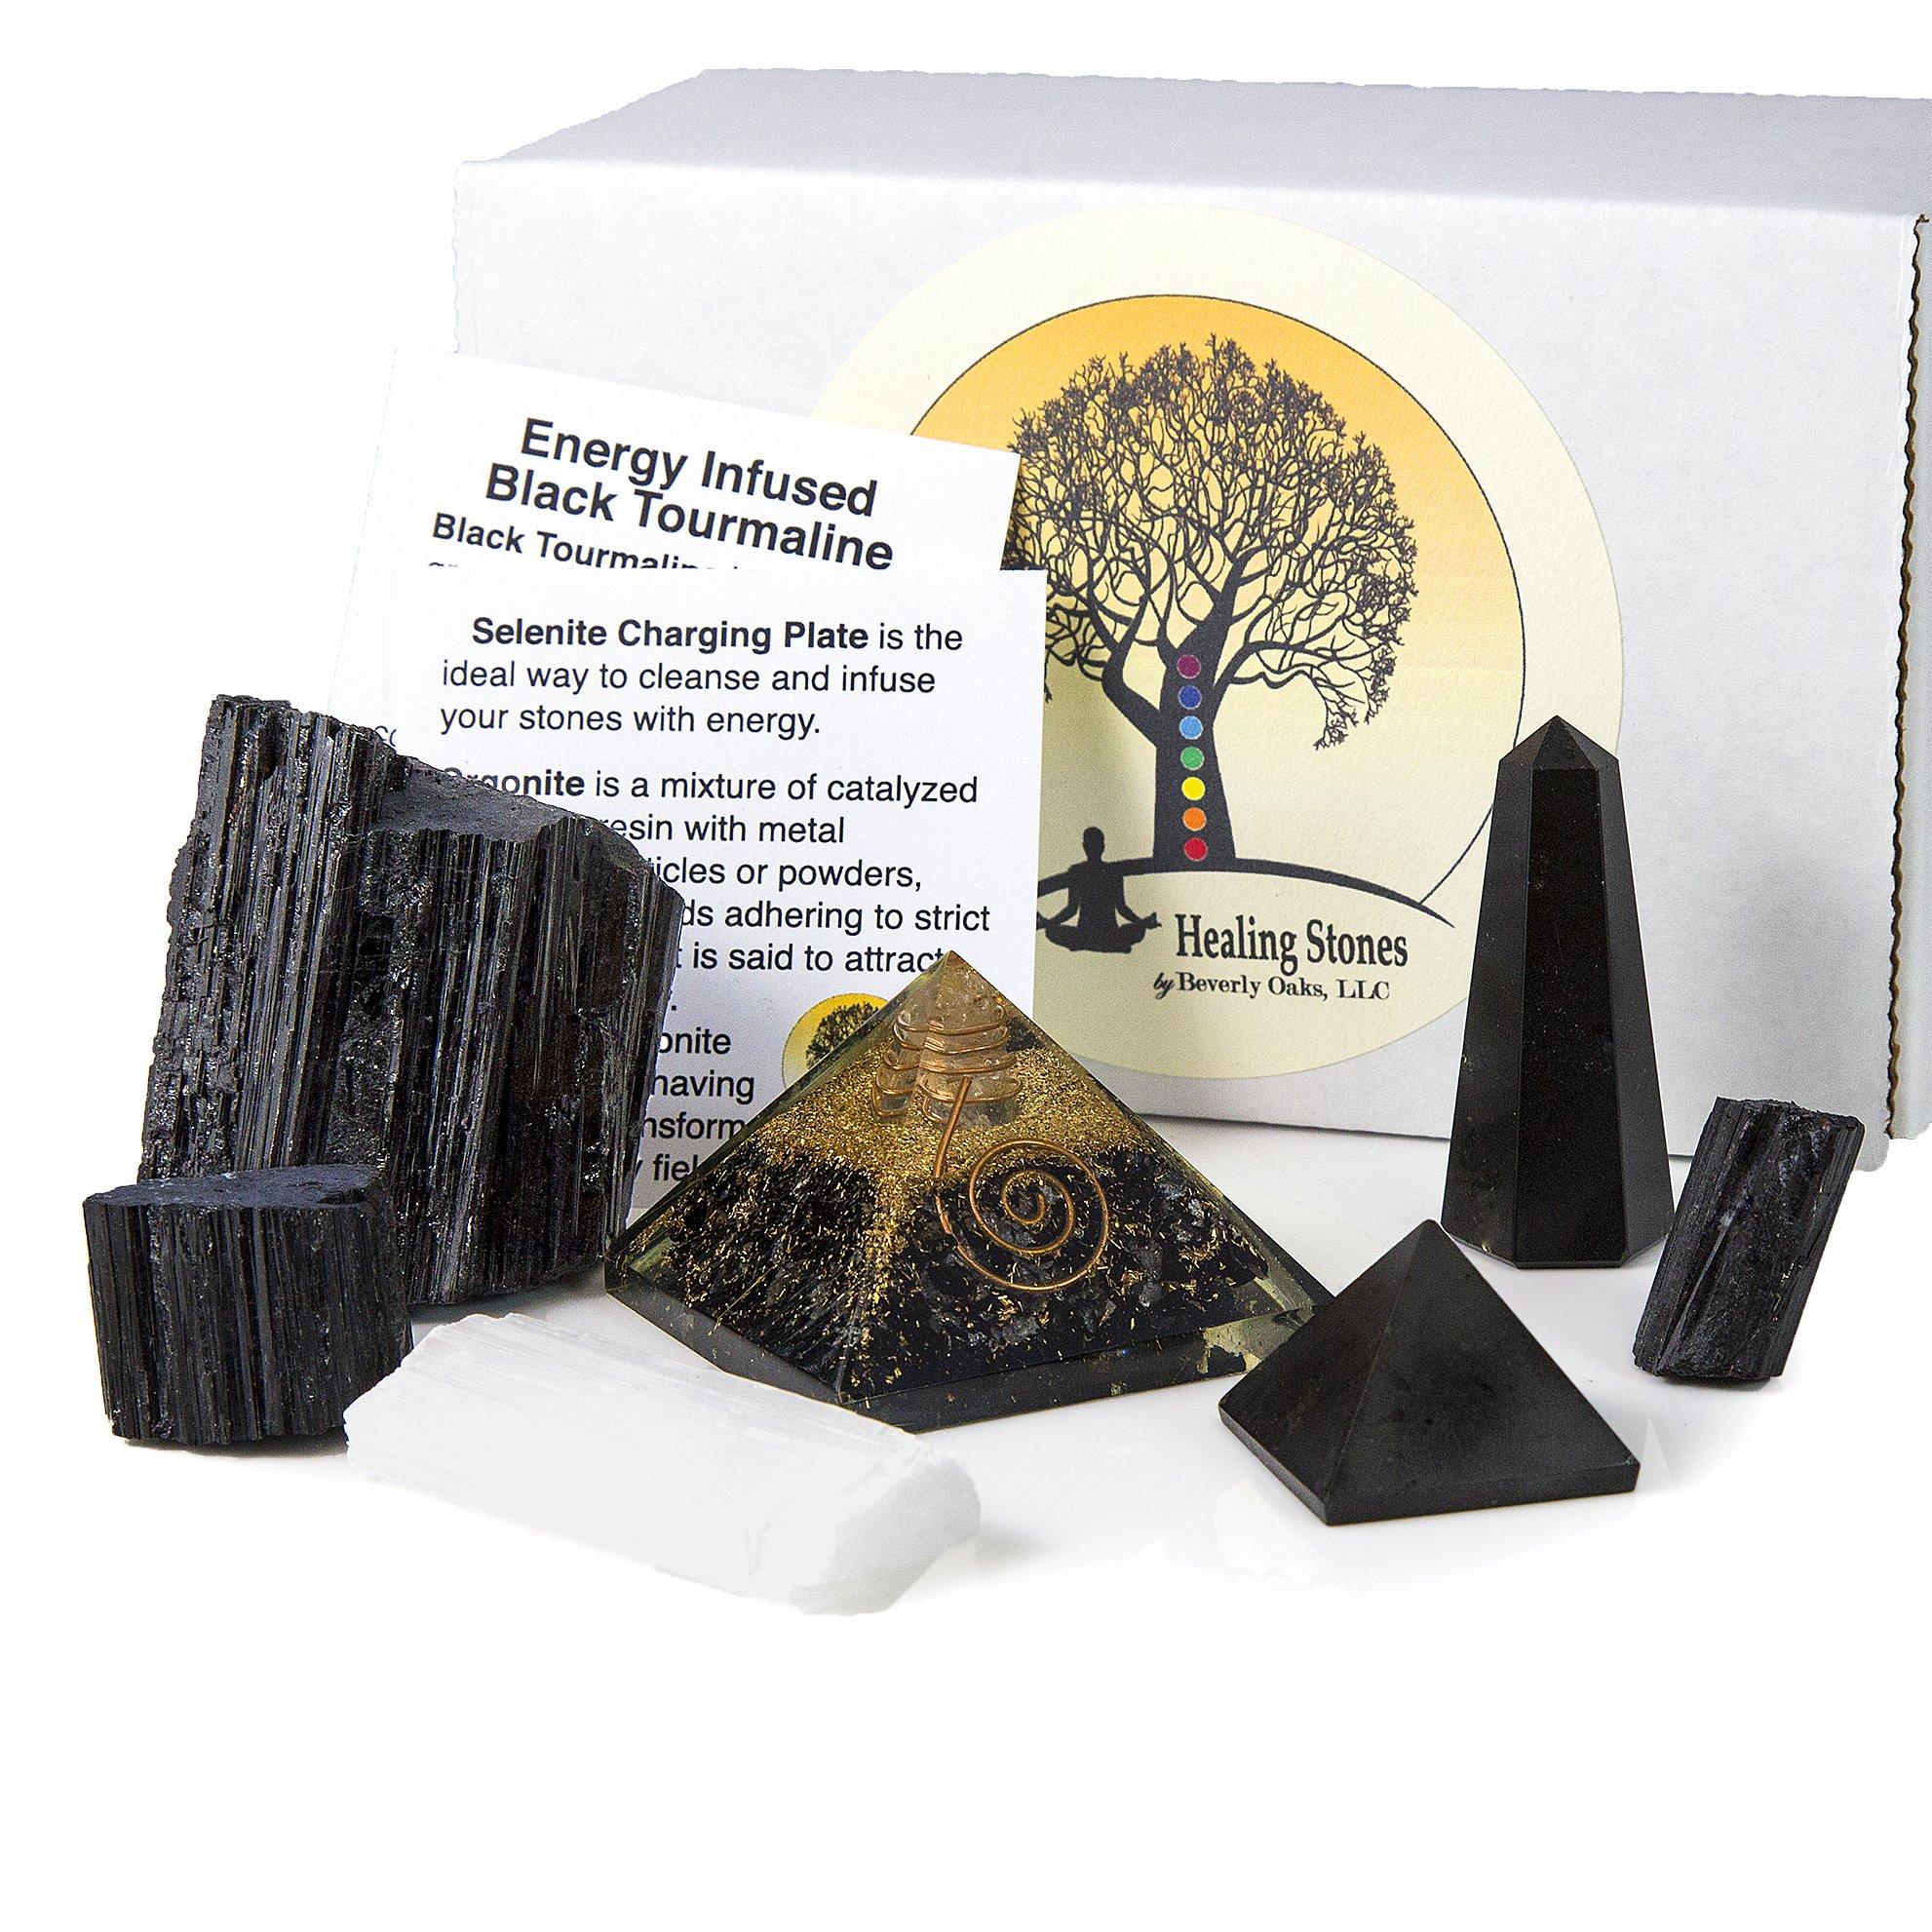 Beverly Oaks Charged Black Tourmaline Crystal Complete Kit - Tourmaline Stone EMF Protection Grounding - Three Raw Tourmaline Chunks, Orgonite Pyramid, Selenite, Gemstone Pyramid Obelisk